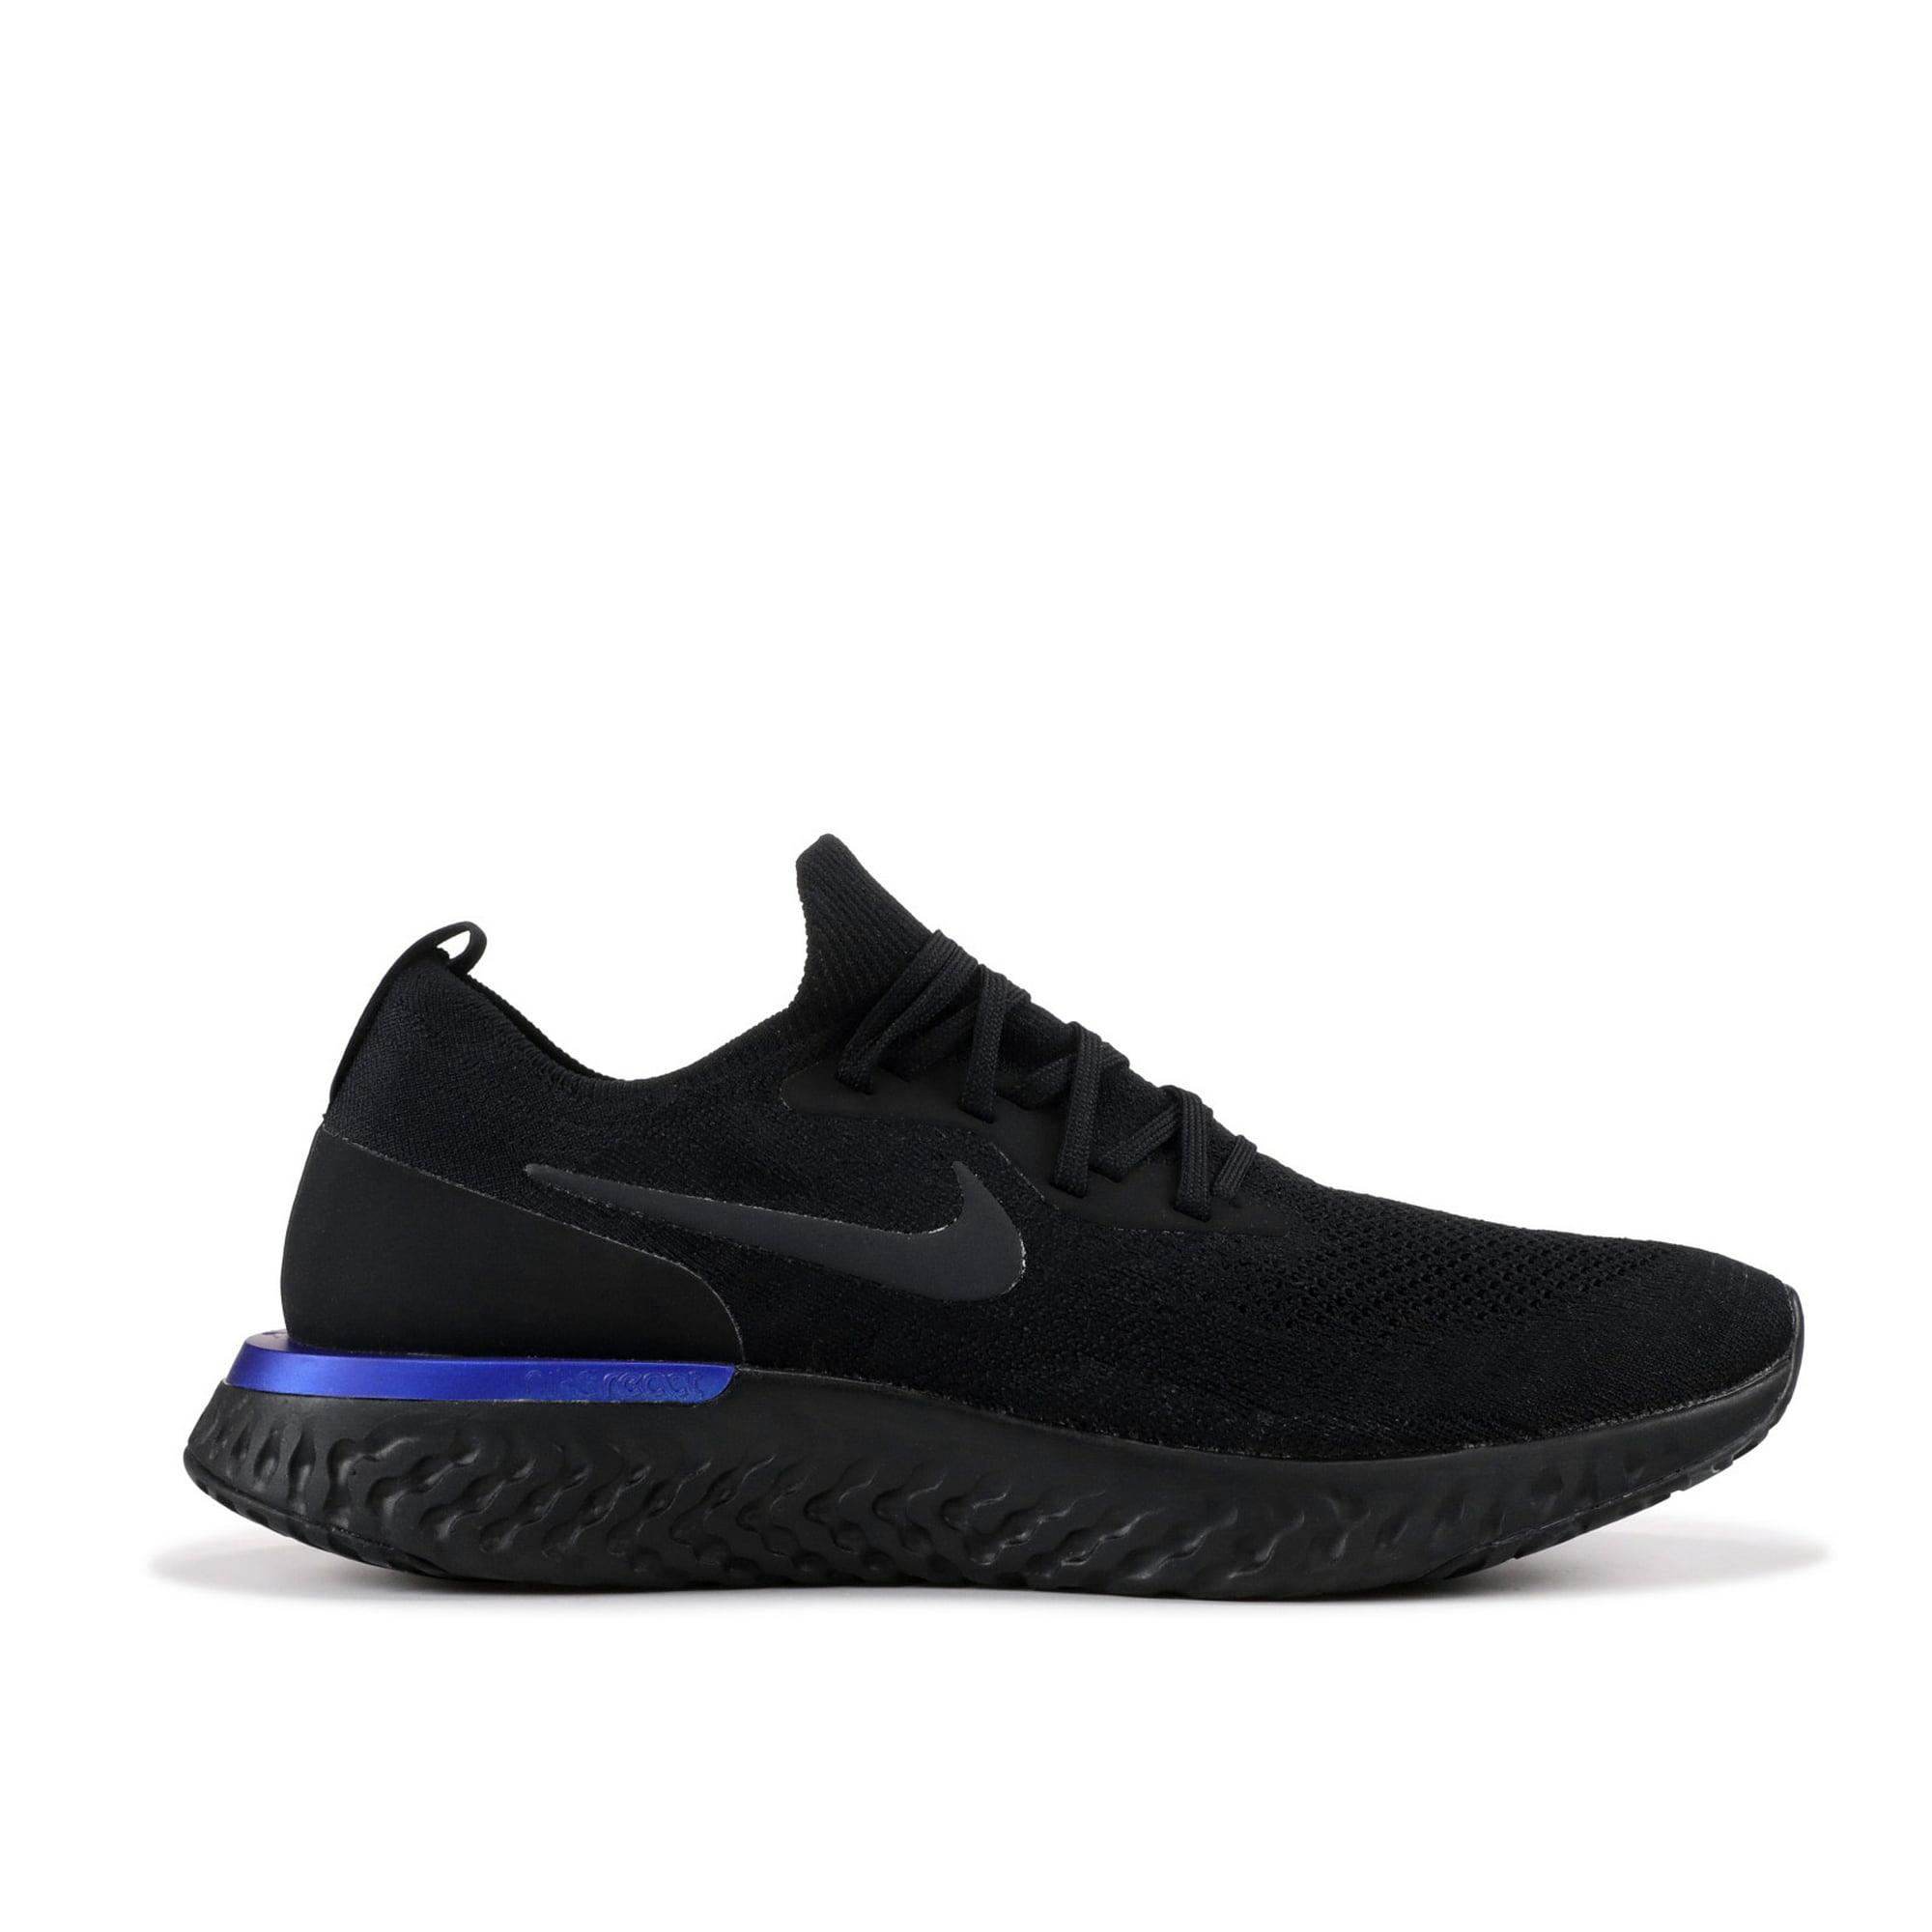 in stock 6c7ca 03a0b Nike - Men - Nike Epic React Flyknit - Aq0067-004 - Size 10.5